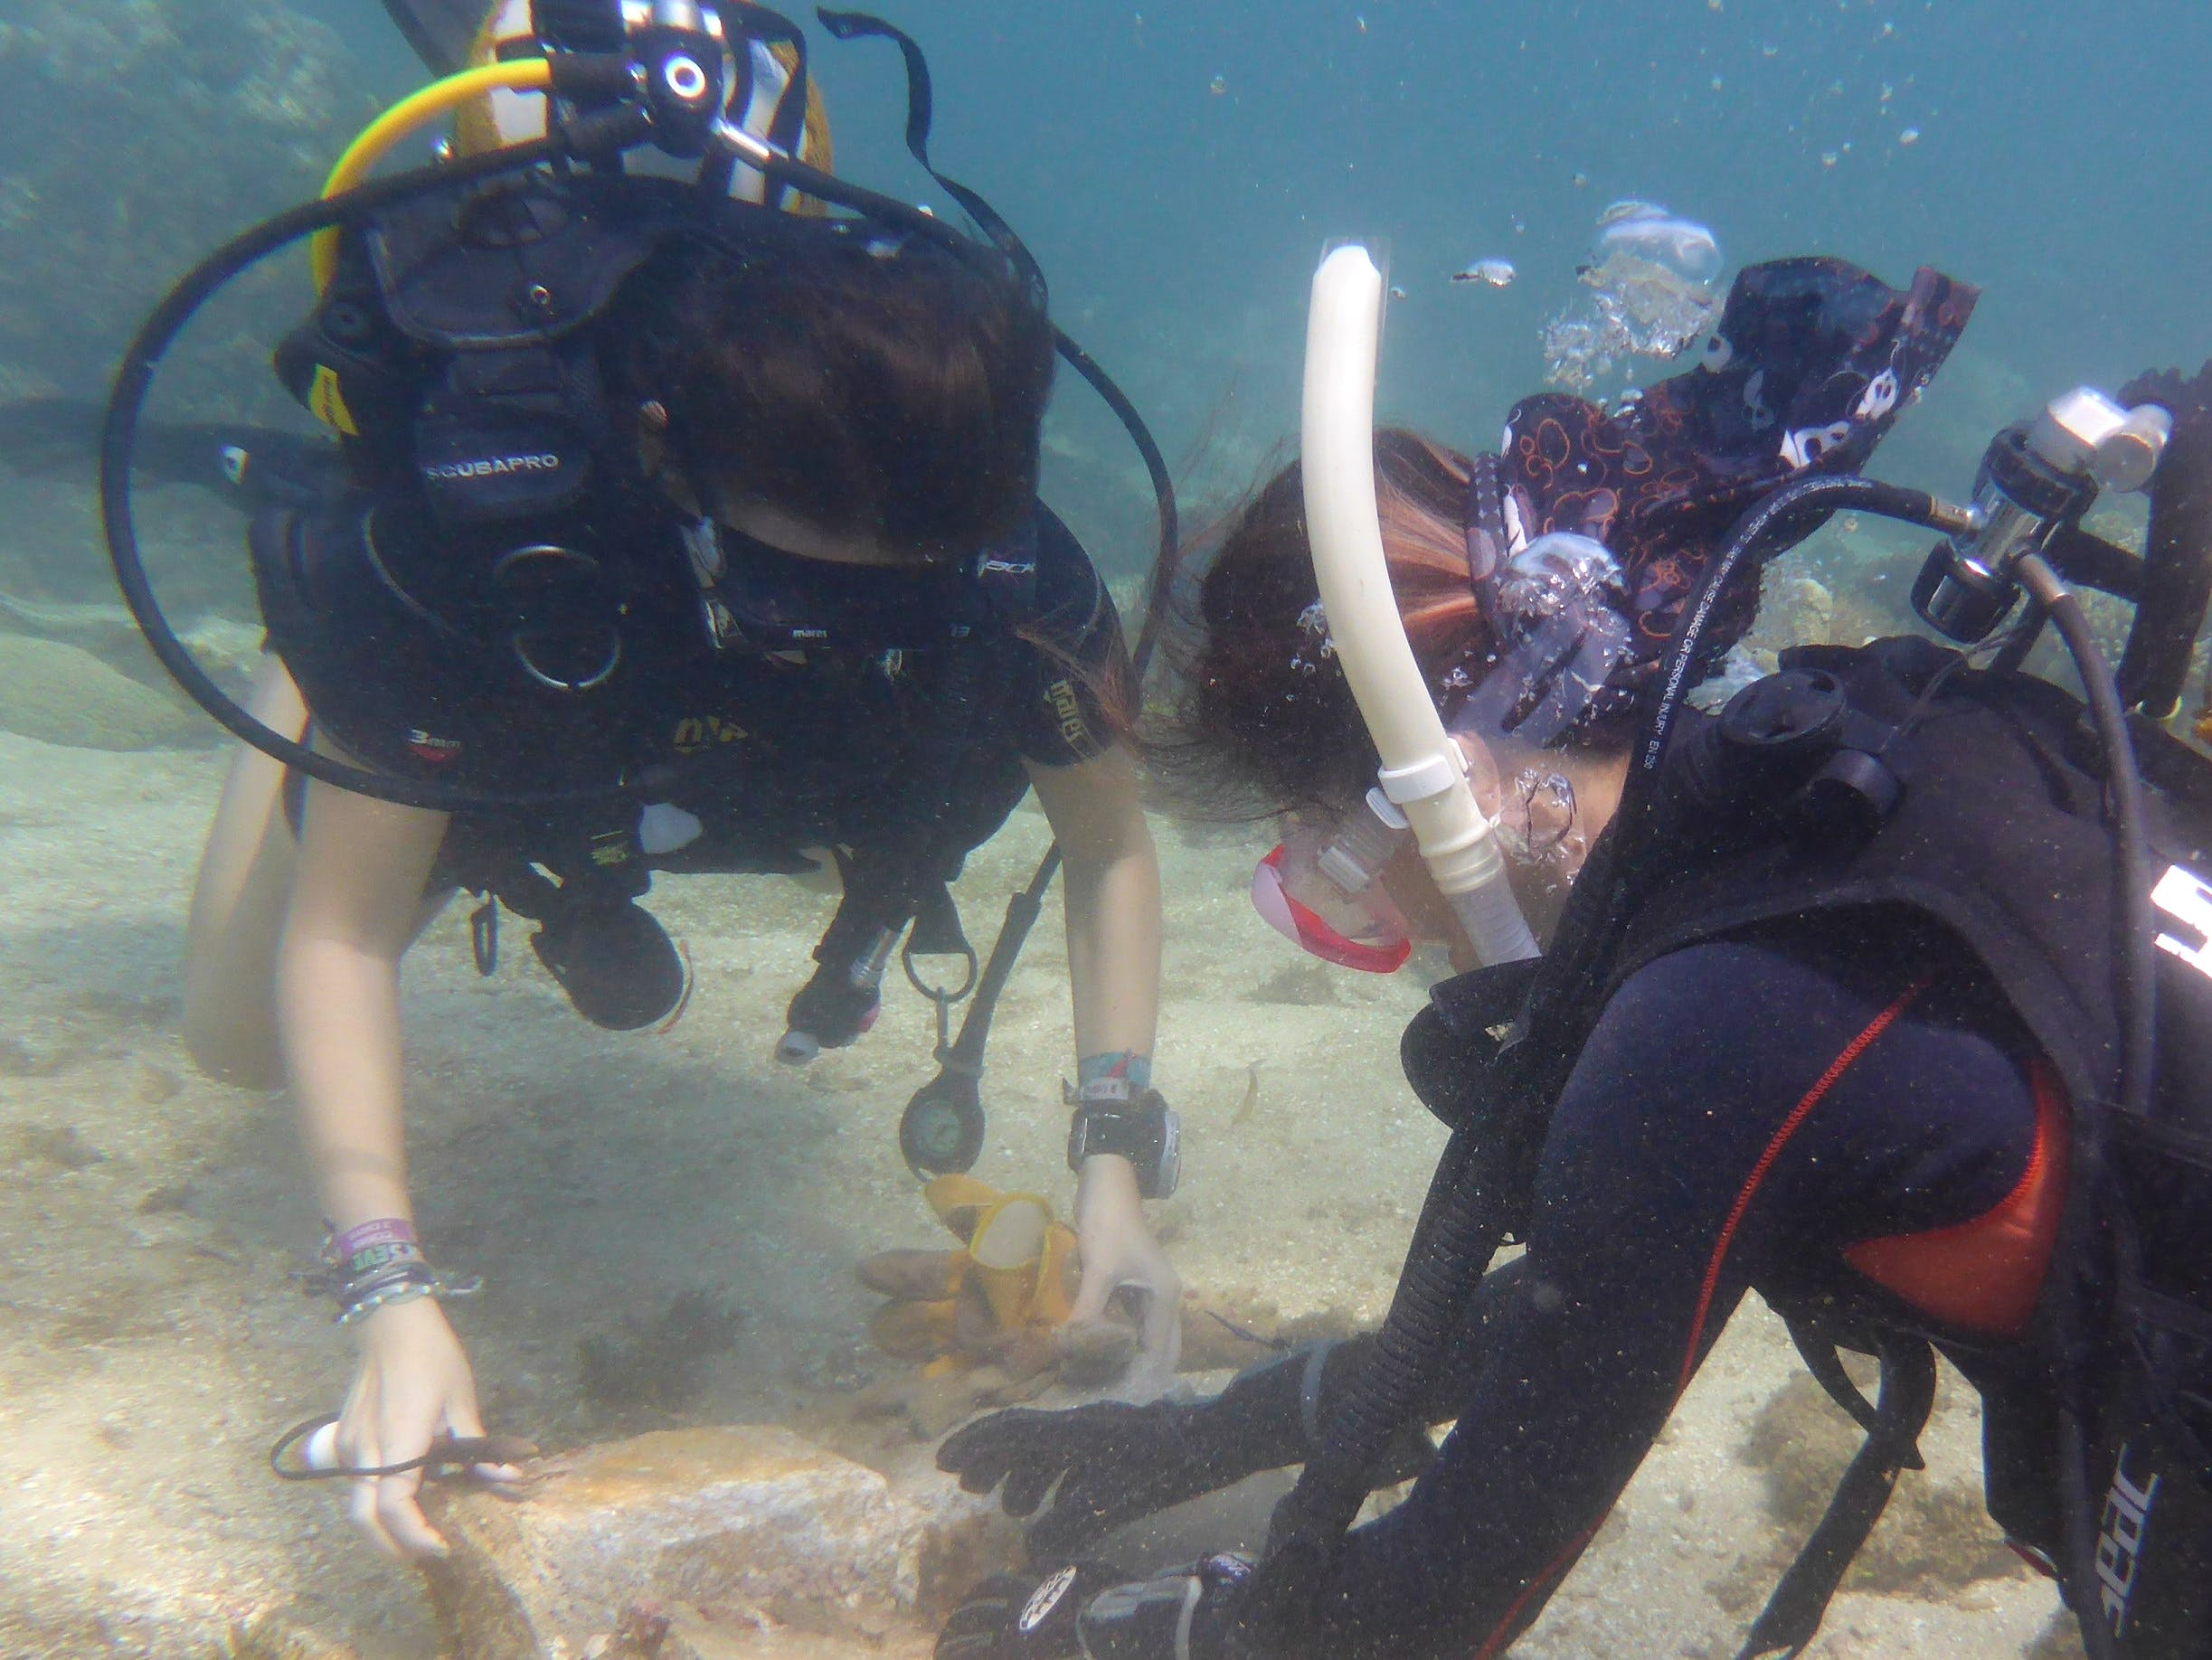 Marine Conservation Assistance